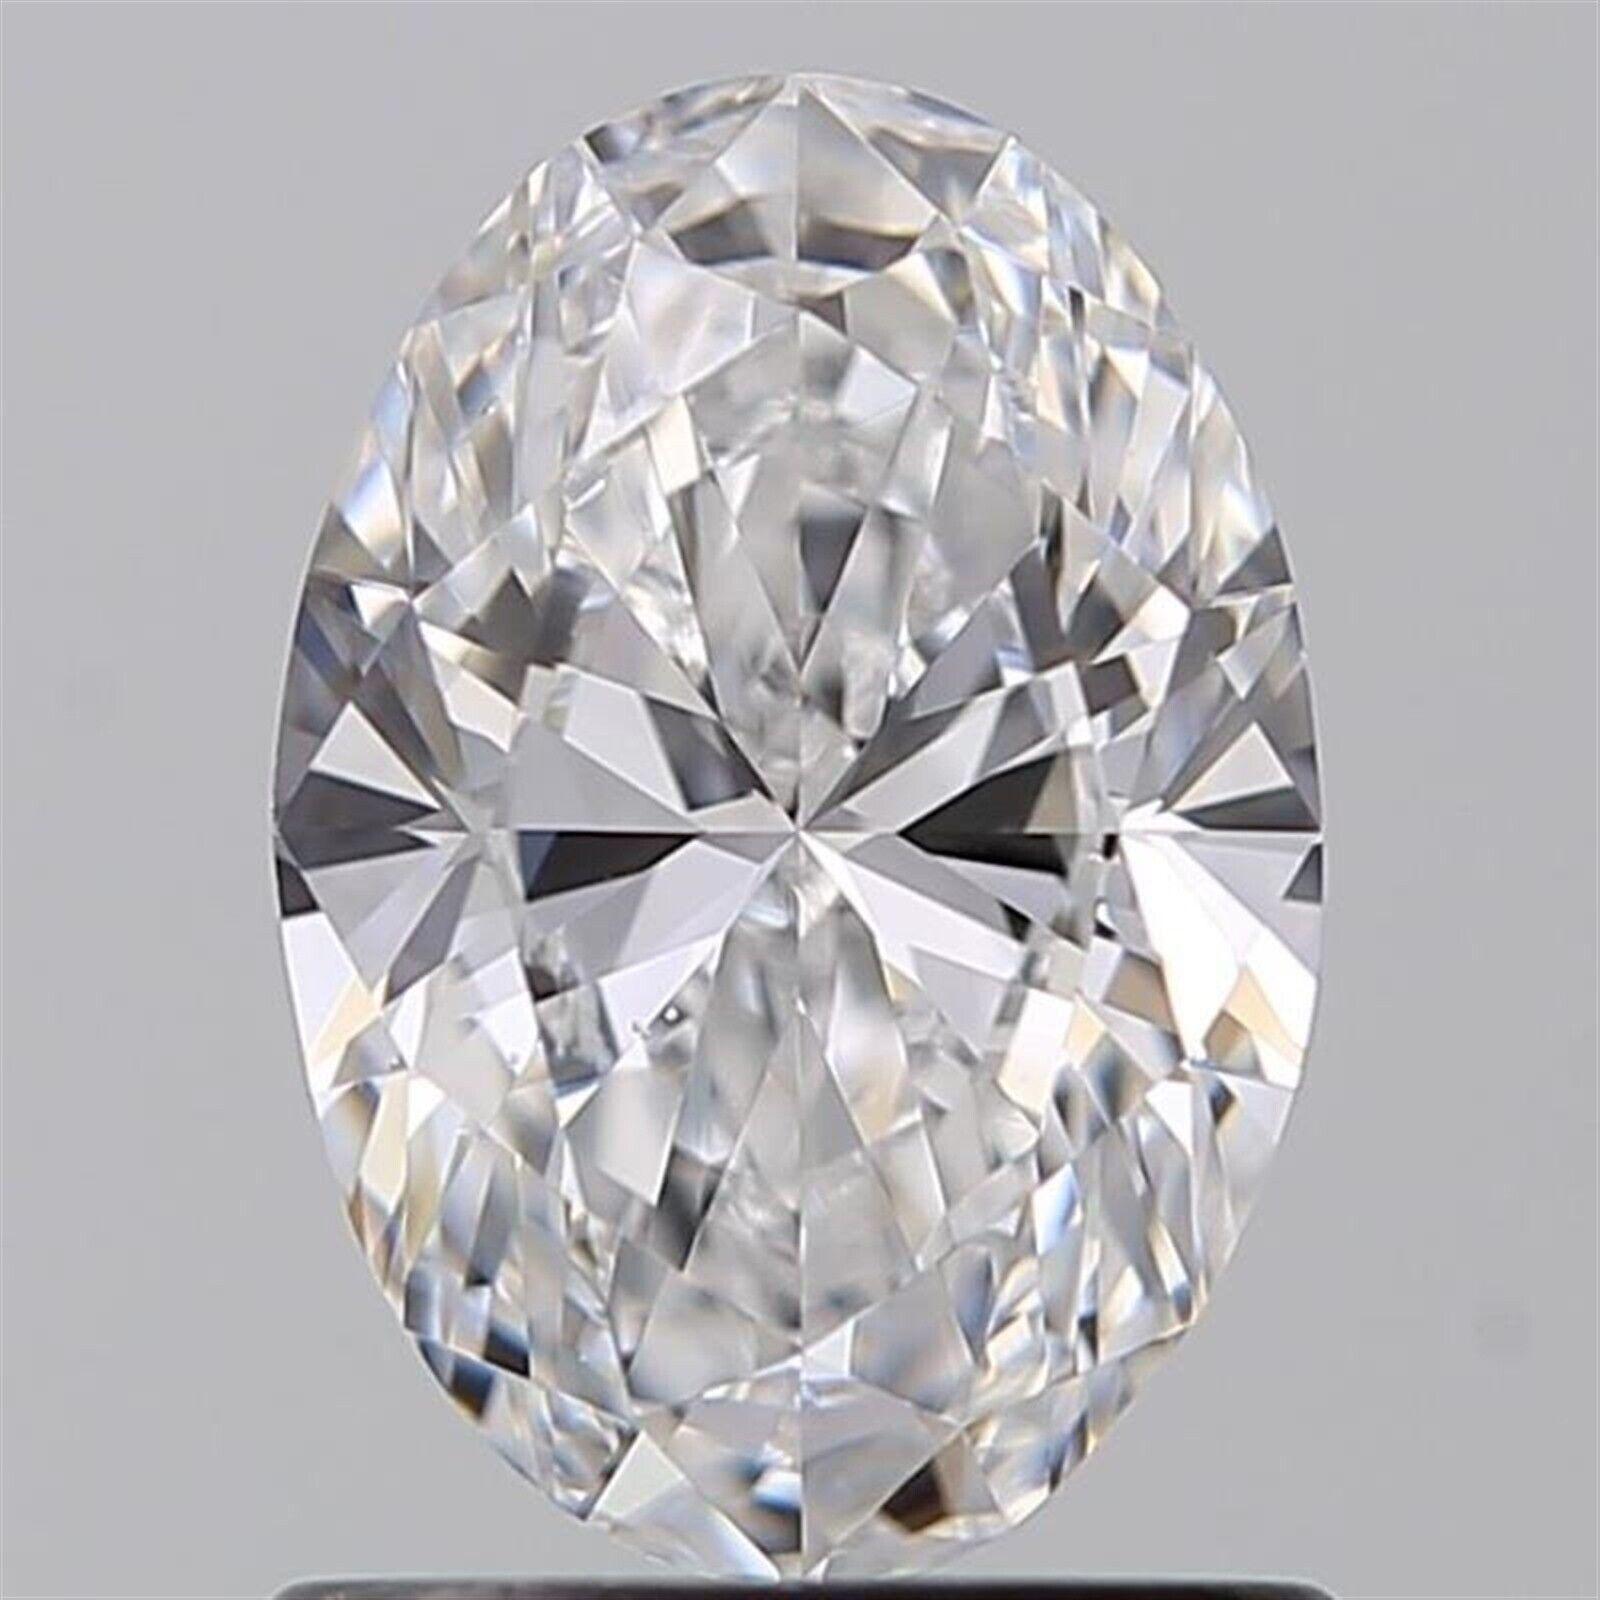 1.01 ct D Color SI1 Clarity Oval 100% Natural Loose Diamond EX Cut GIA FL Medium